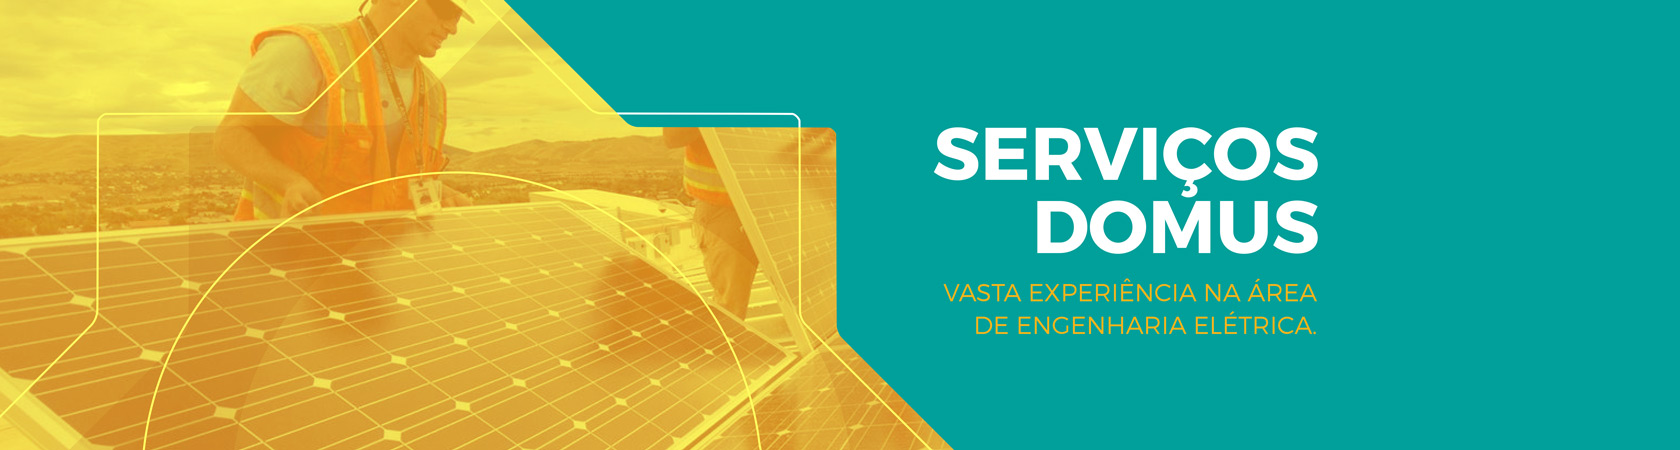 banner-domus-solar-servicos